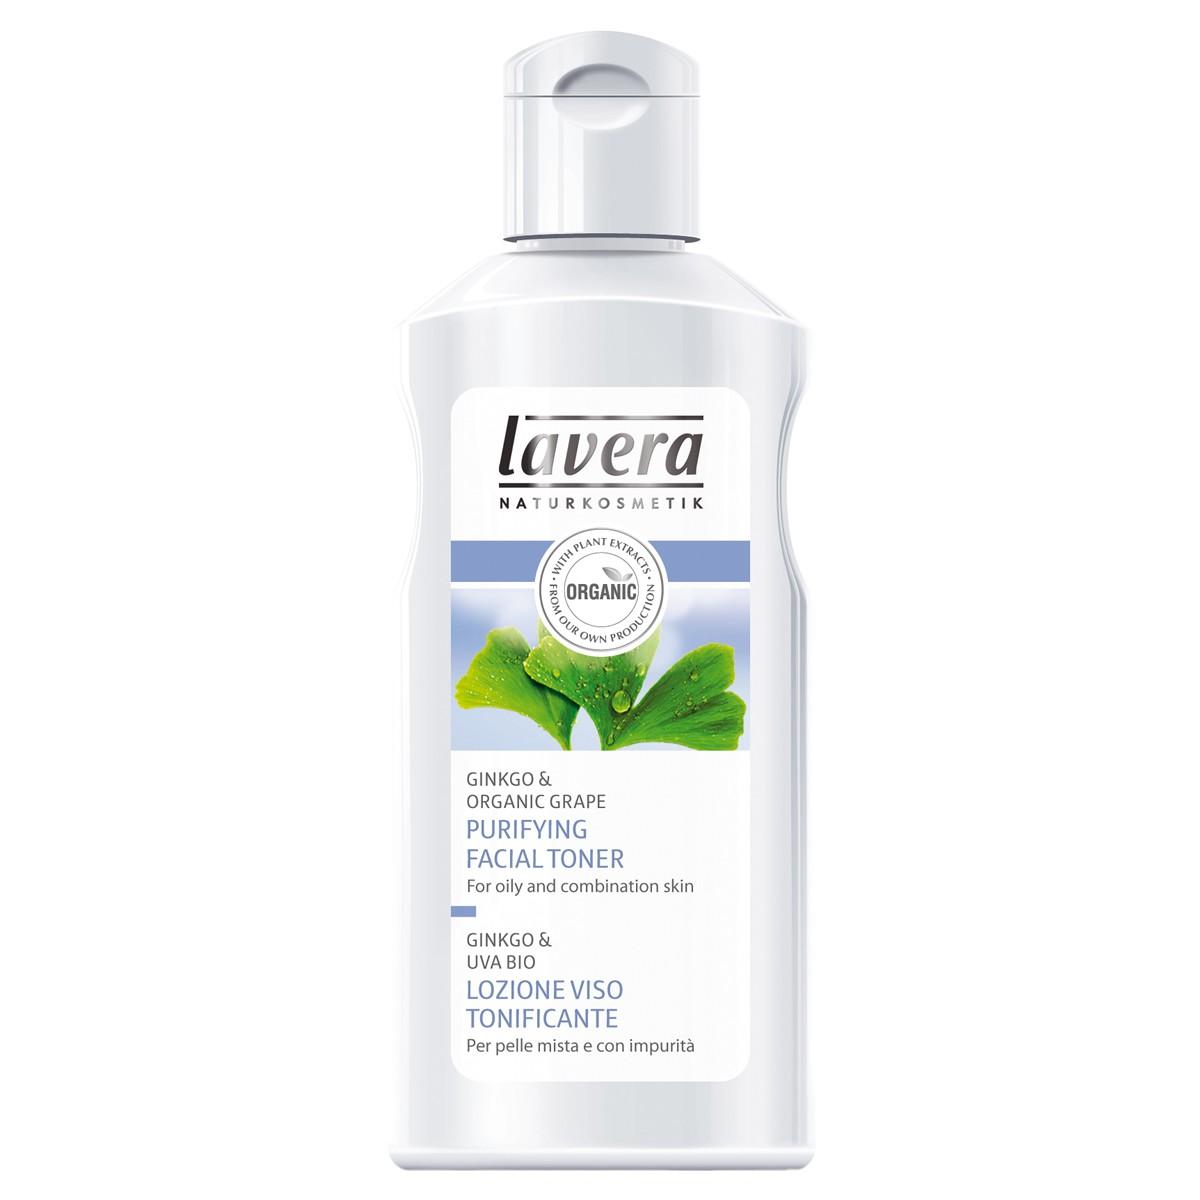 Lavera Organic Purifying Facial Toner